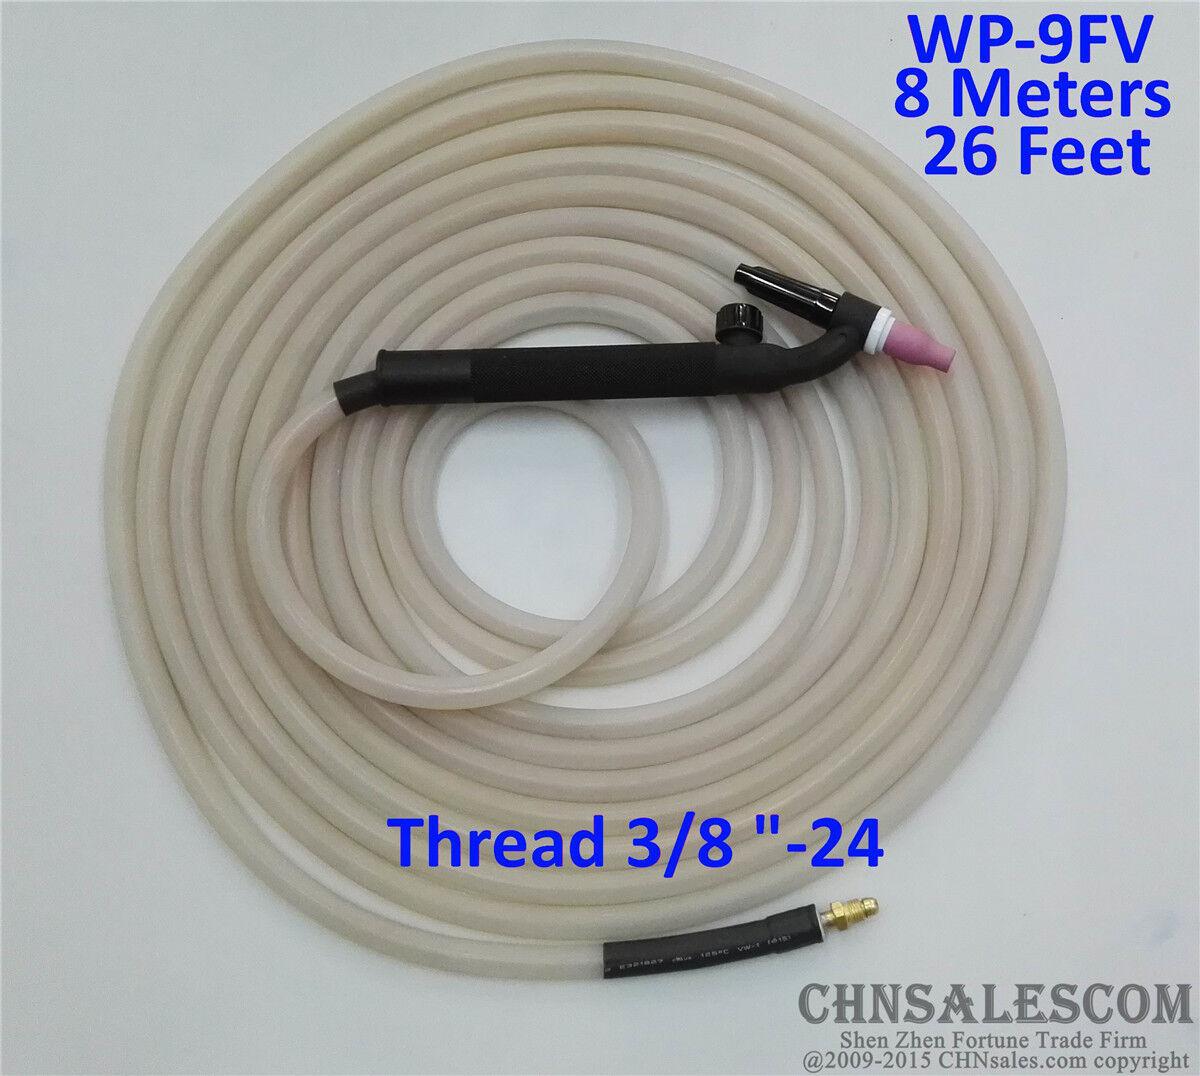 WP-9FV Tig Welding Torch Silica Gel Hose 4.15 Metre  Super Soft and Flexible